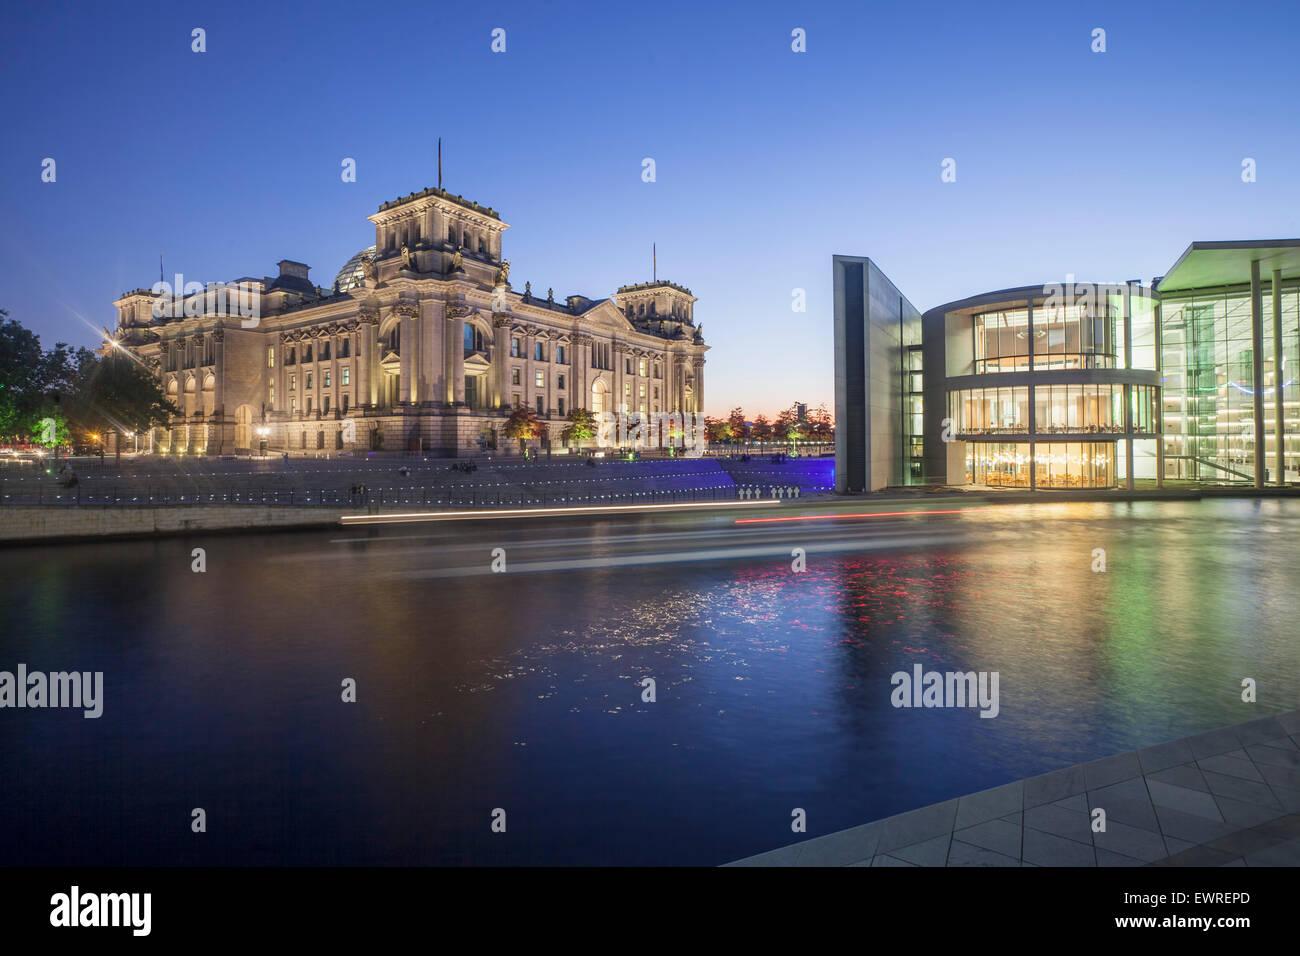 Berlin, Reichstag, Spree, Paul Loebbe Gebäude, Dämmerung, Stockbild